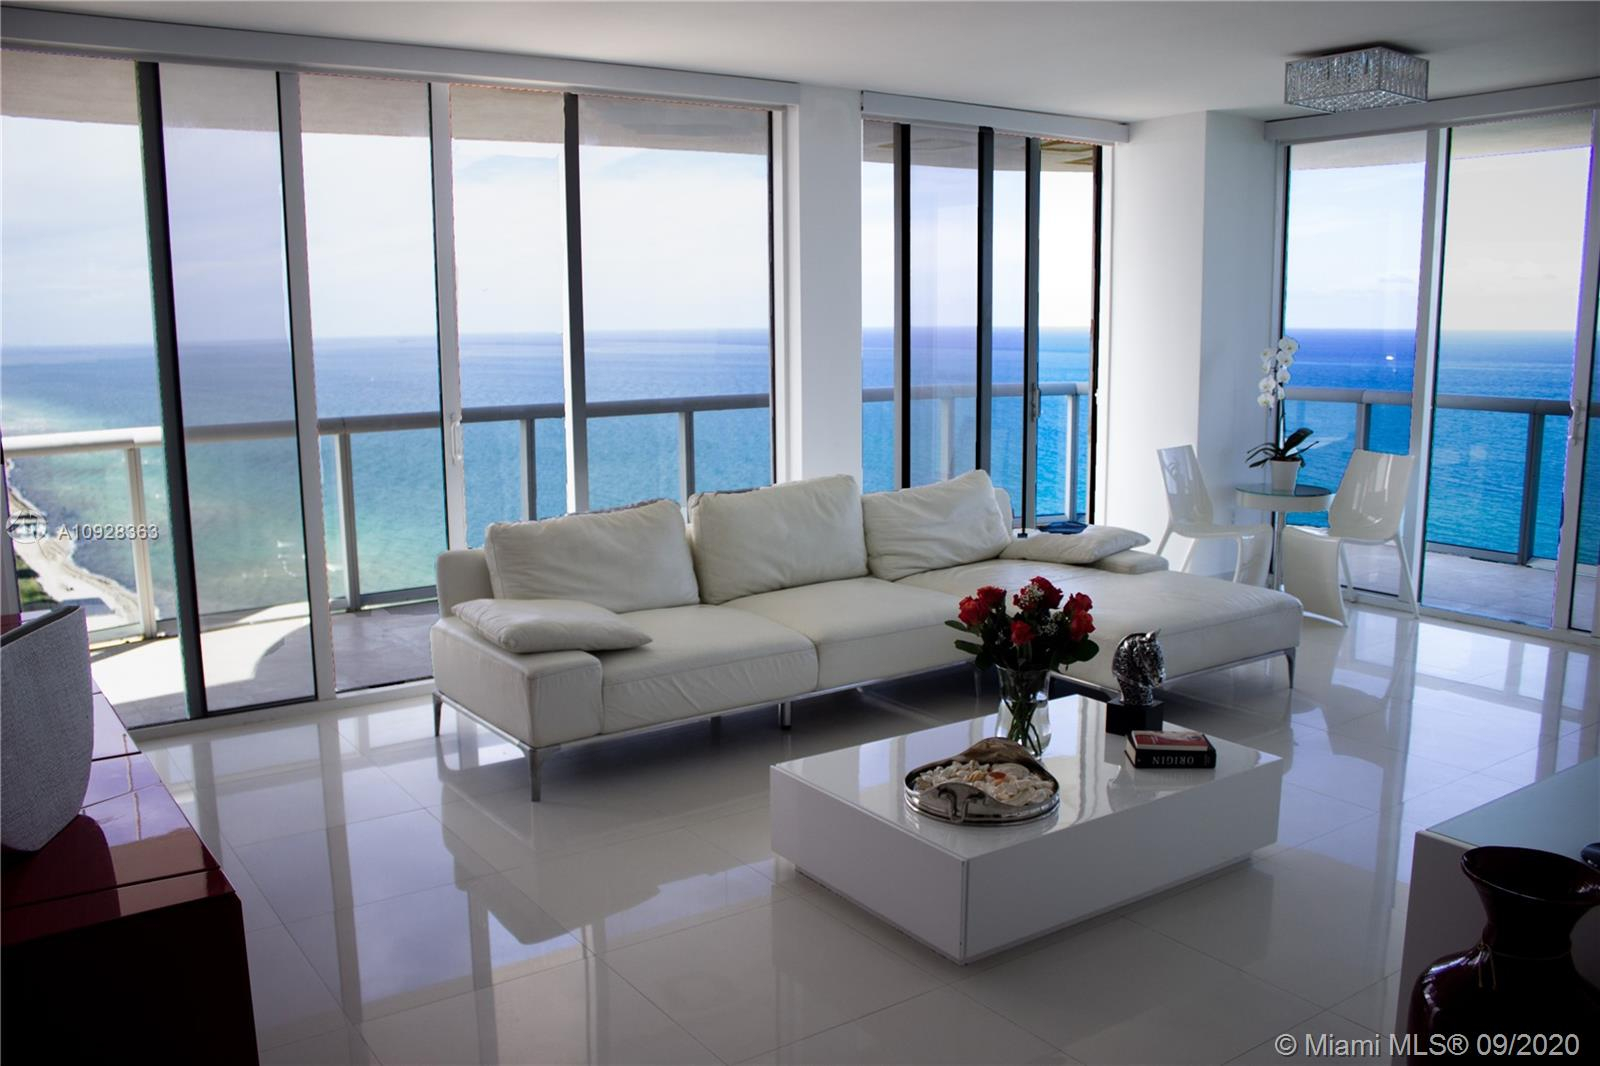 Real Estate Photo A10928363